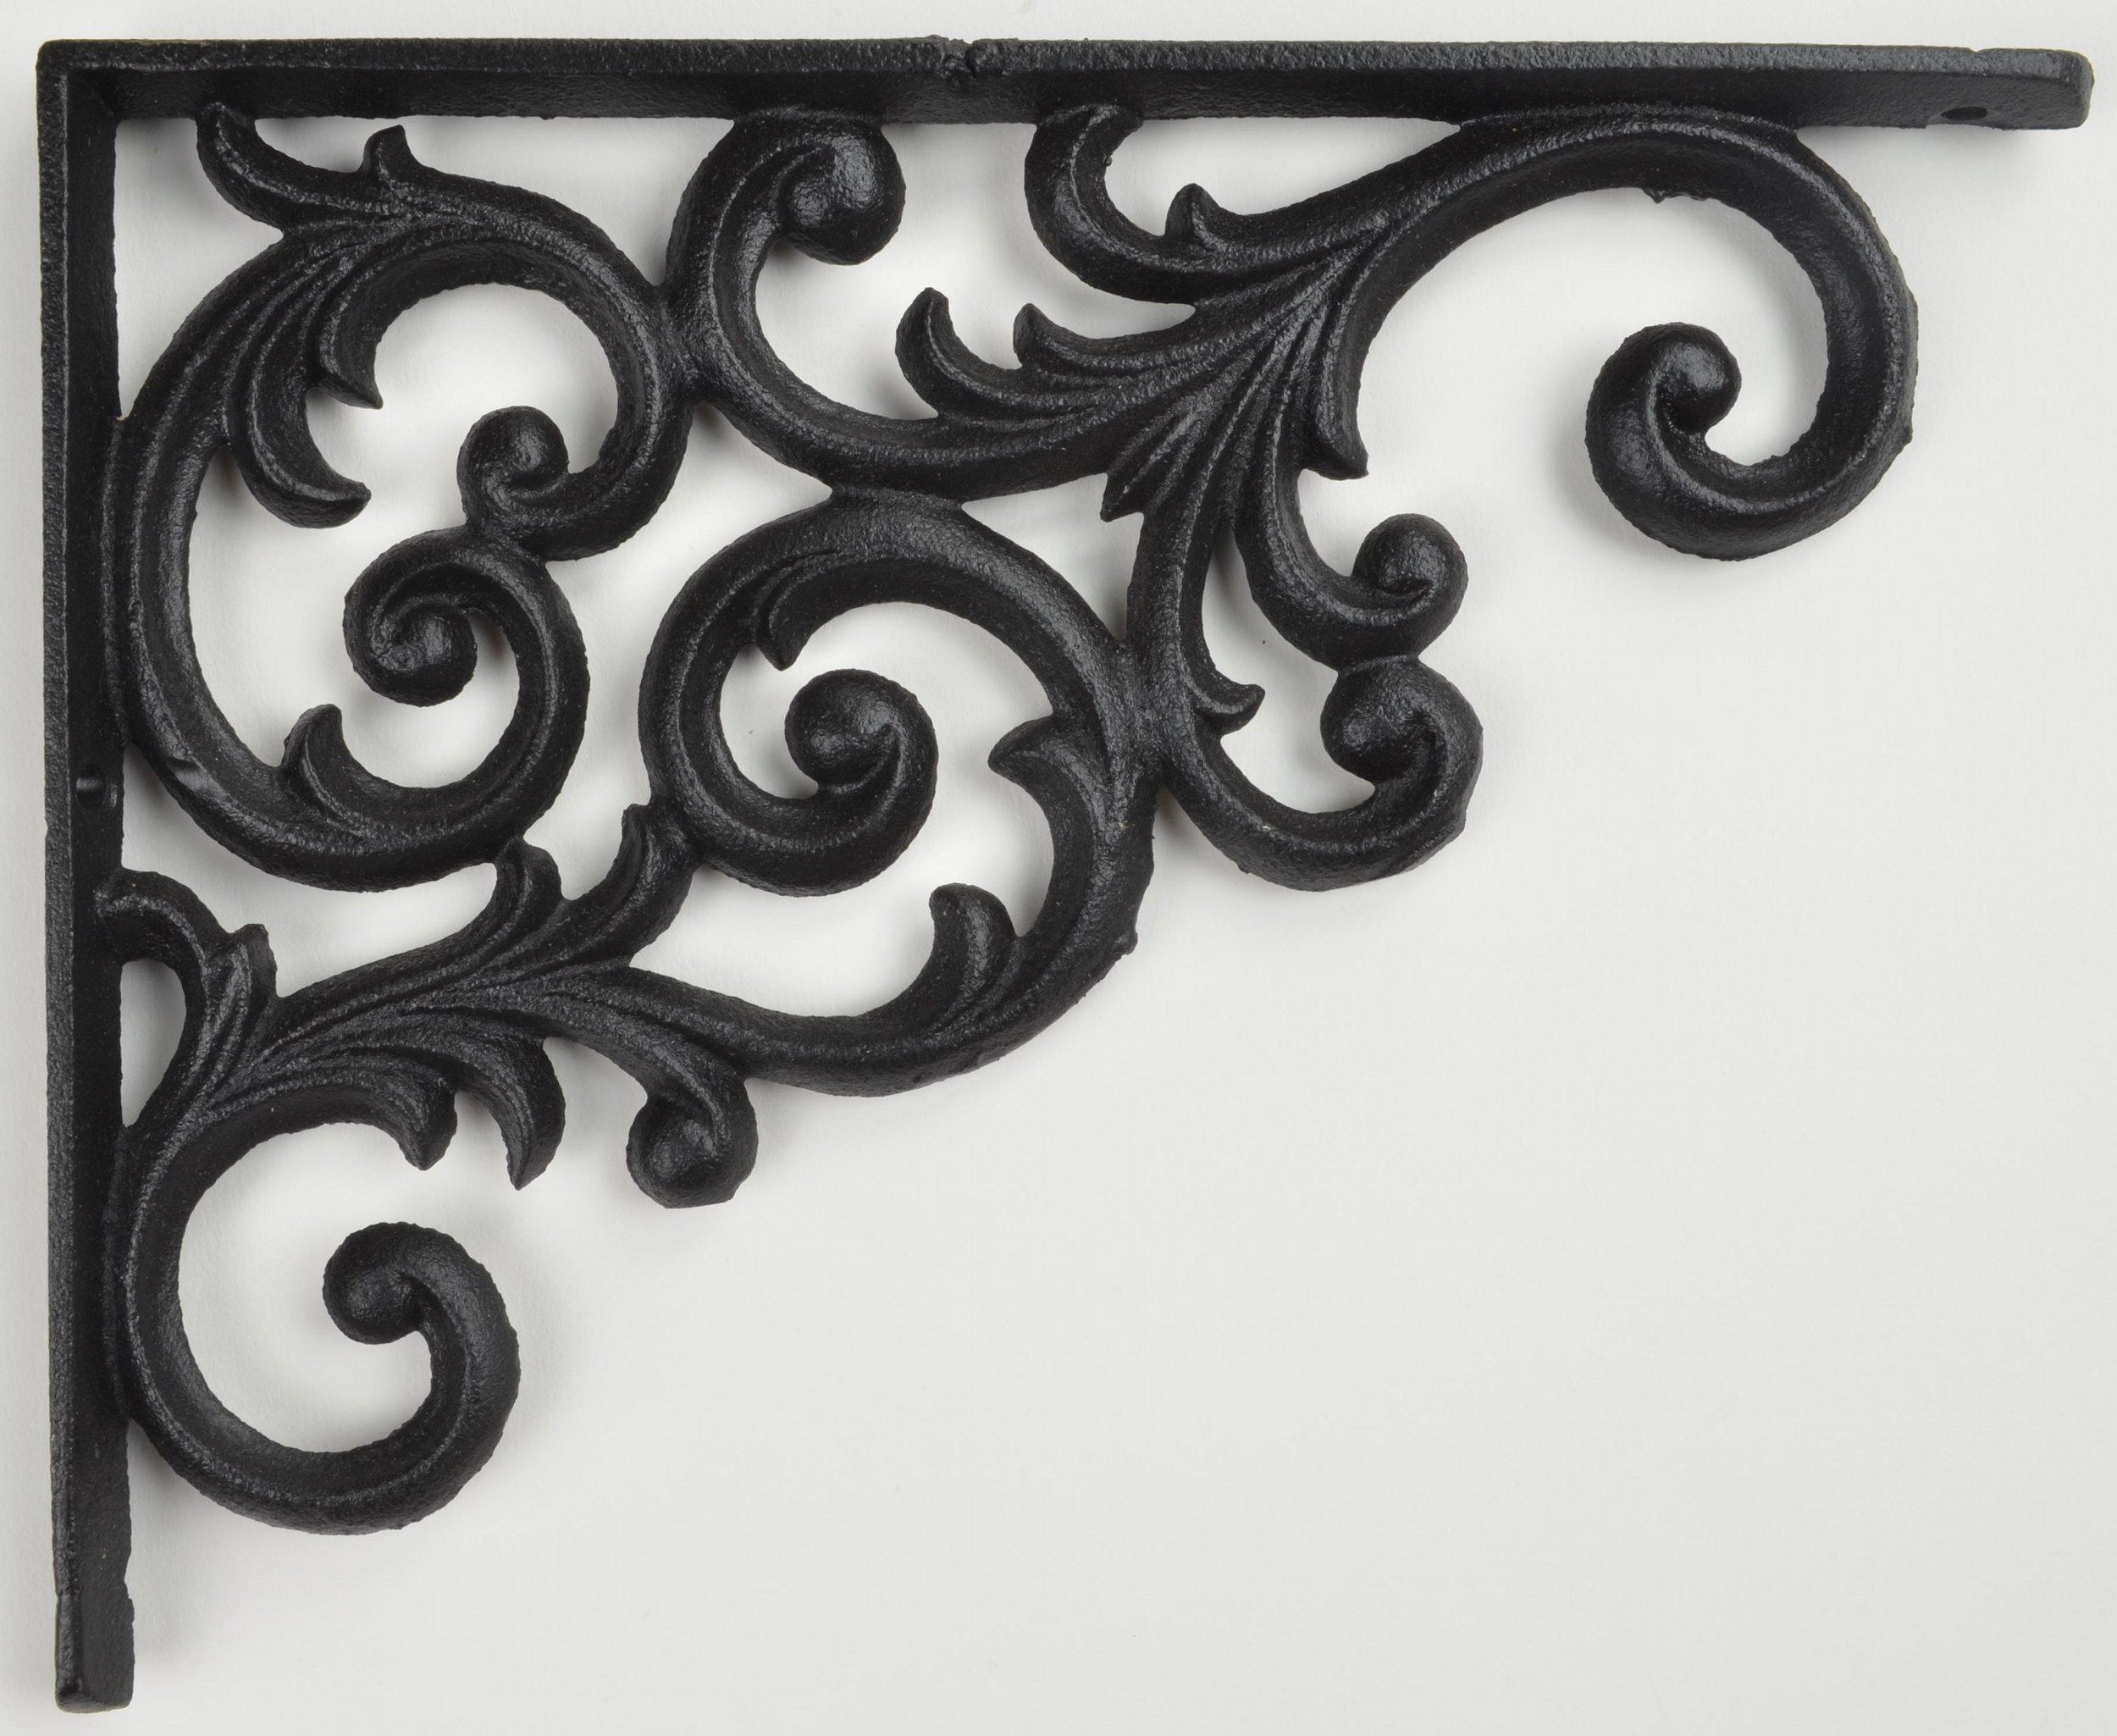 Shelf Bracket Black Cast Iron Ornate Vine Pattern 9.375'' Deep Brace